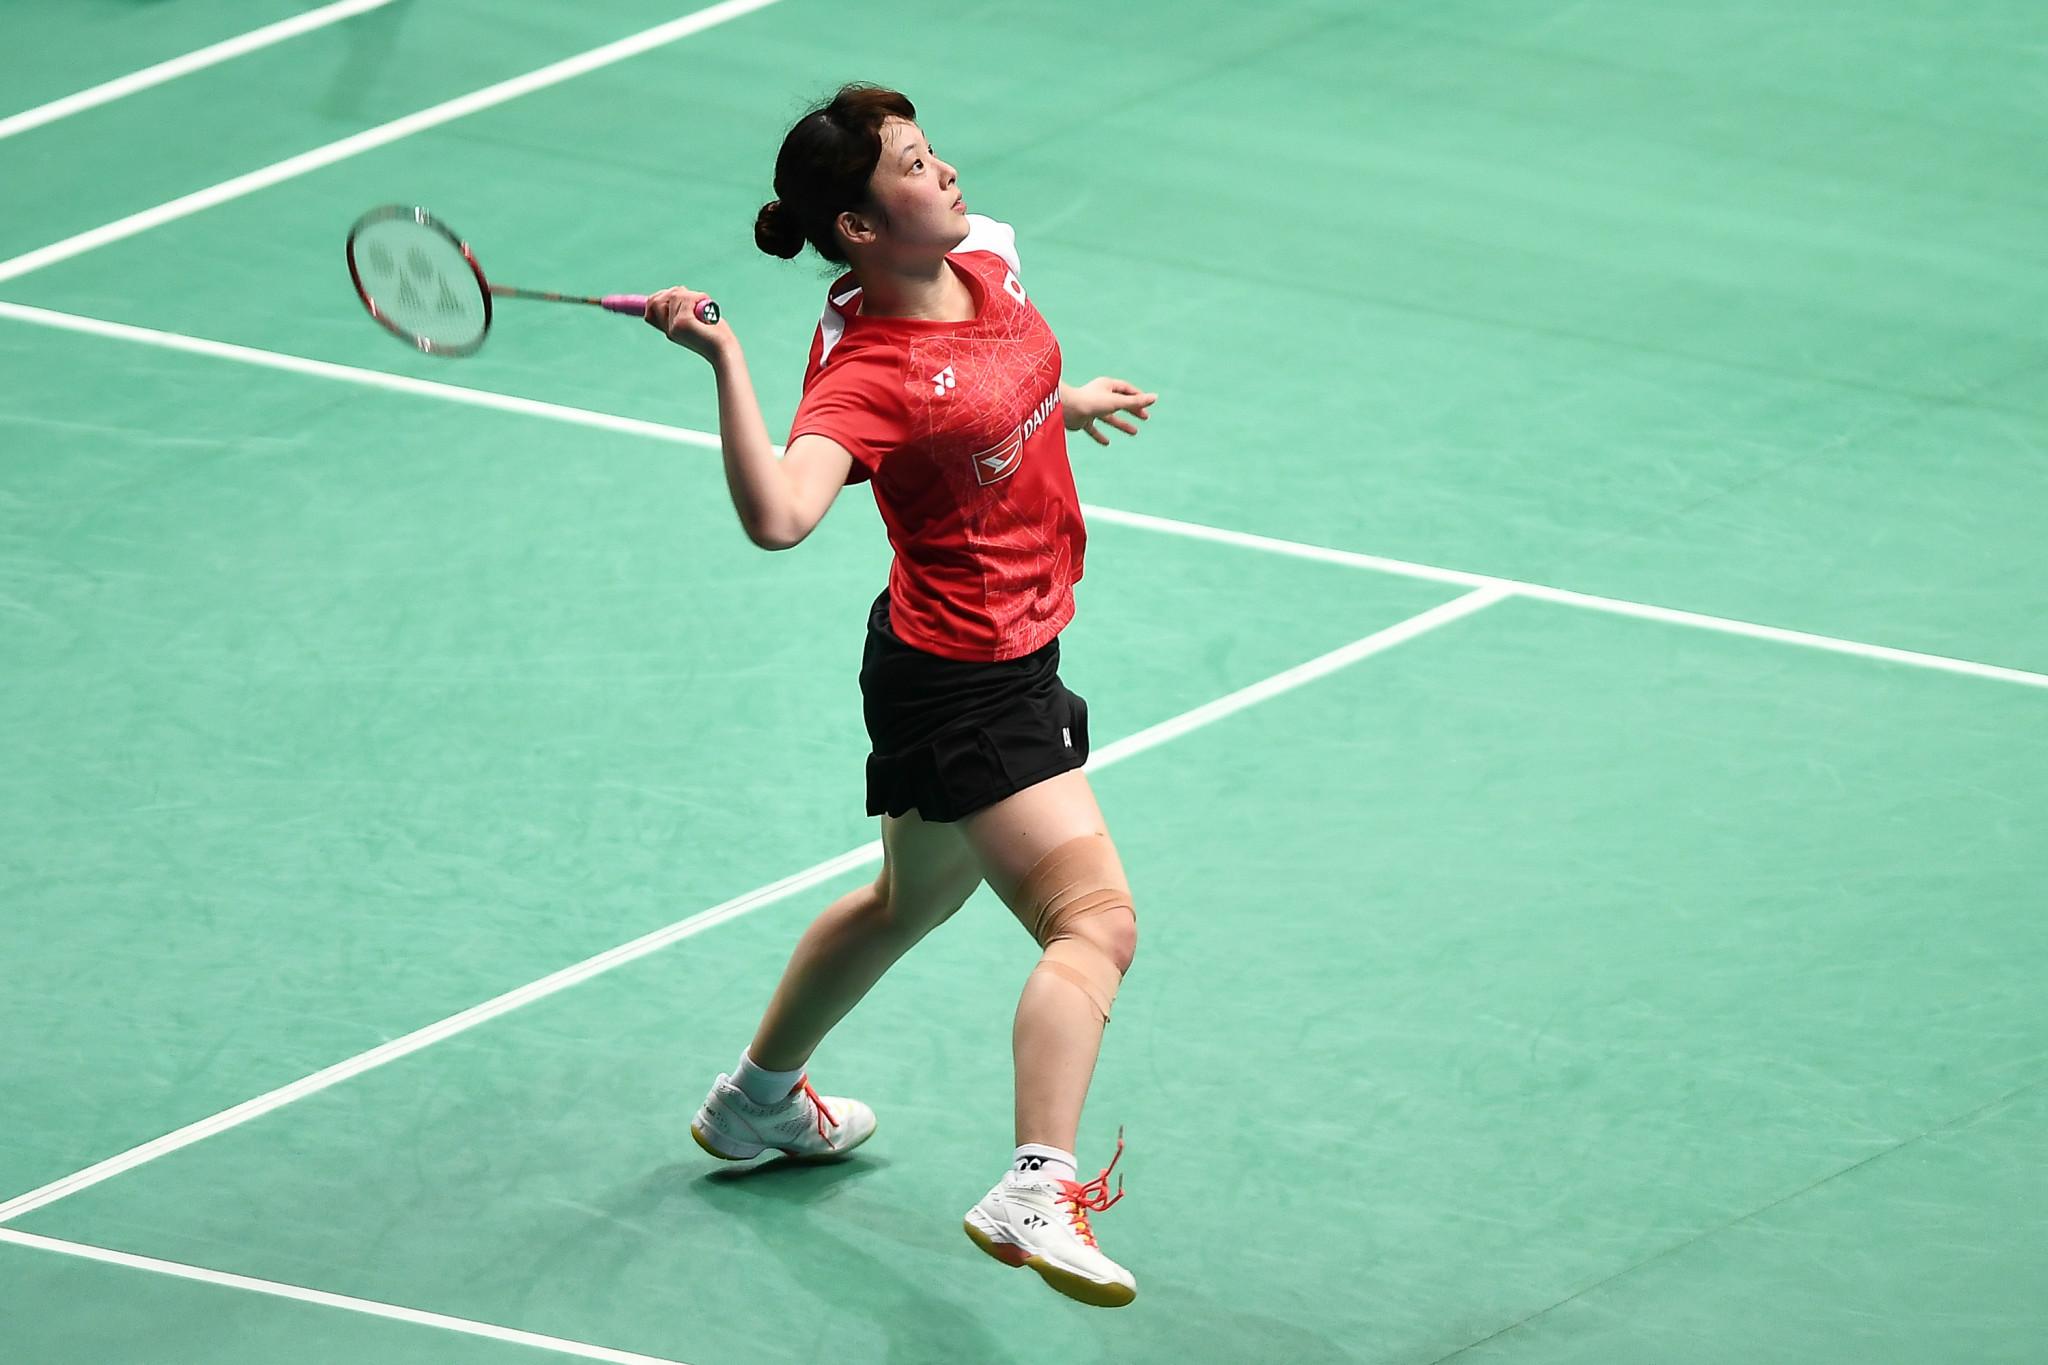 Minatsu Mitani won the women's singles title in Barcelona ©Getty Images